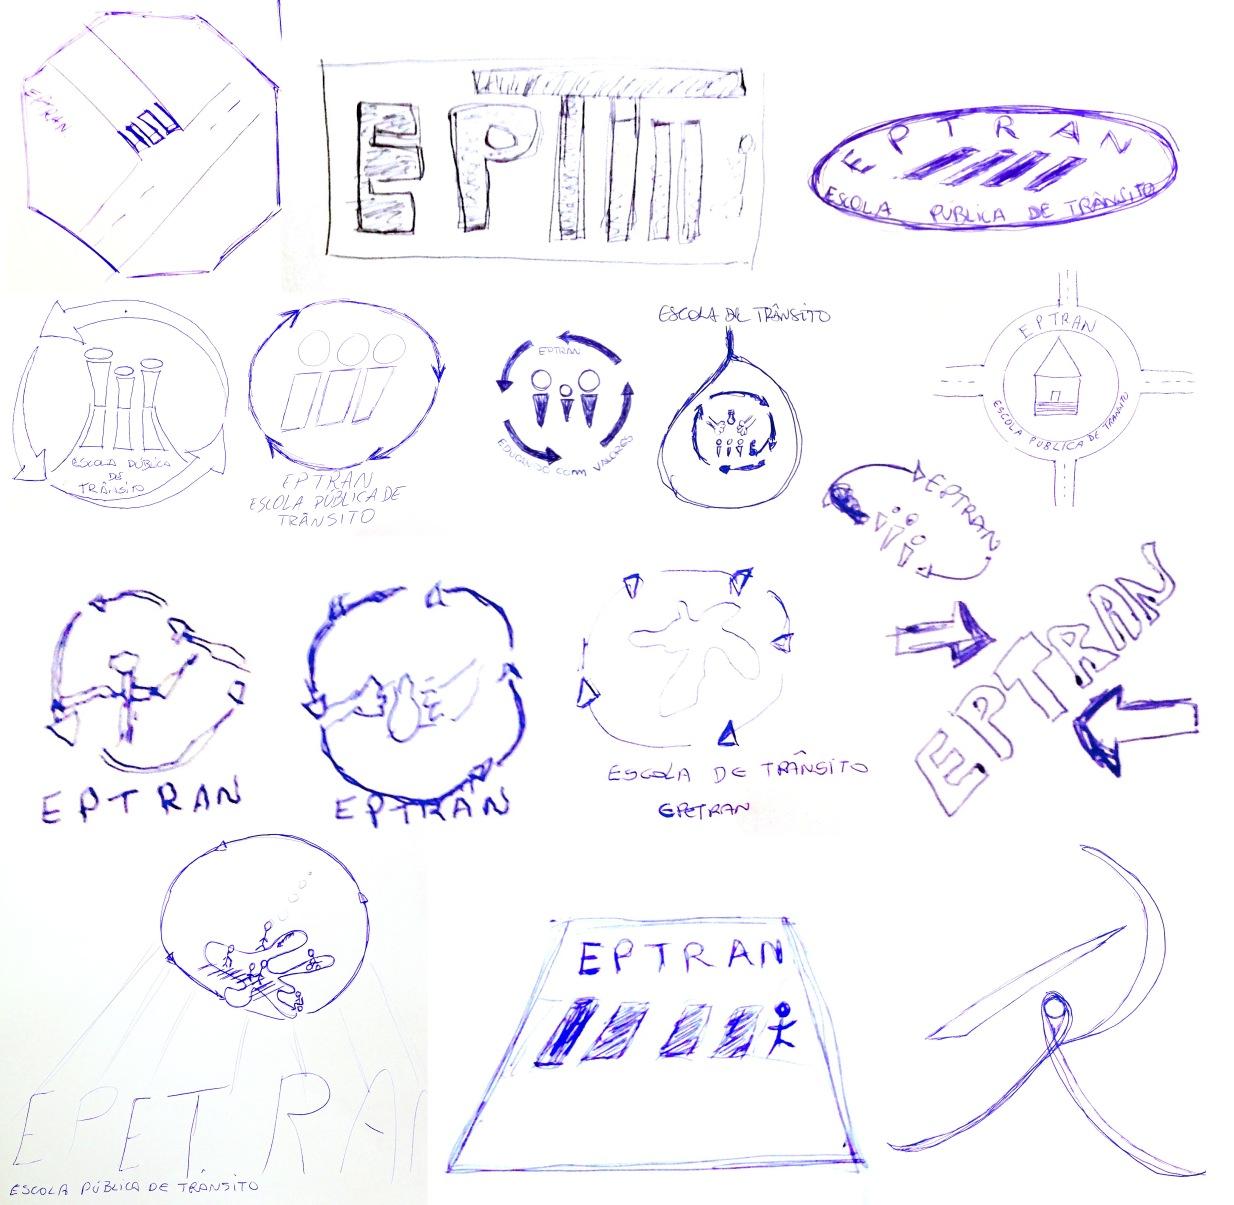 Esbocos eptran logo